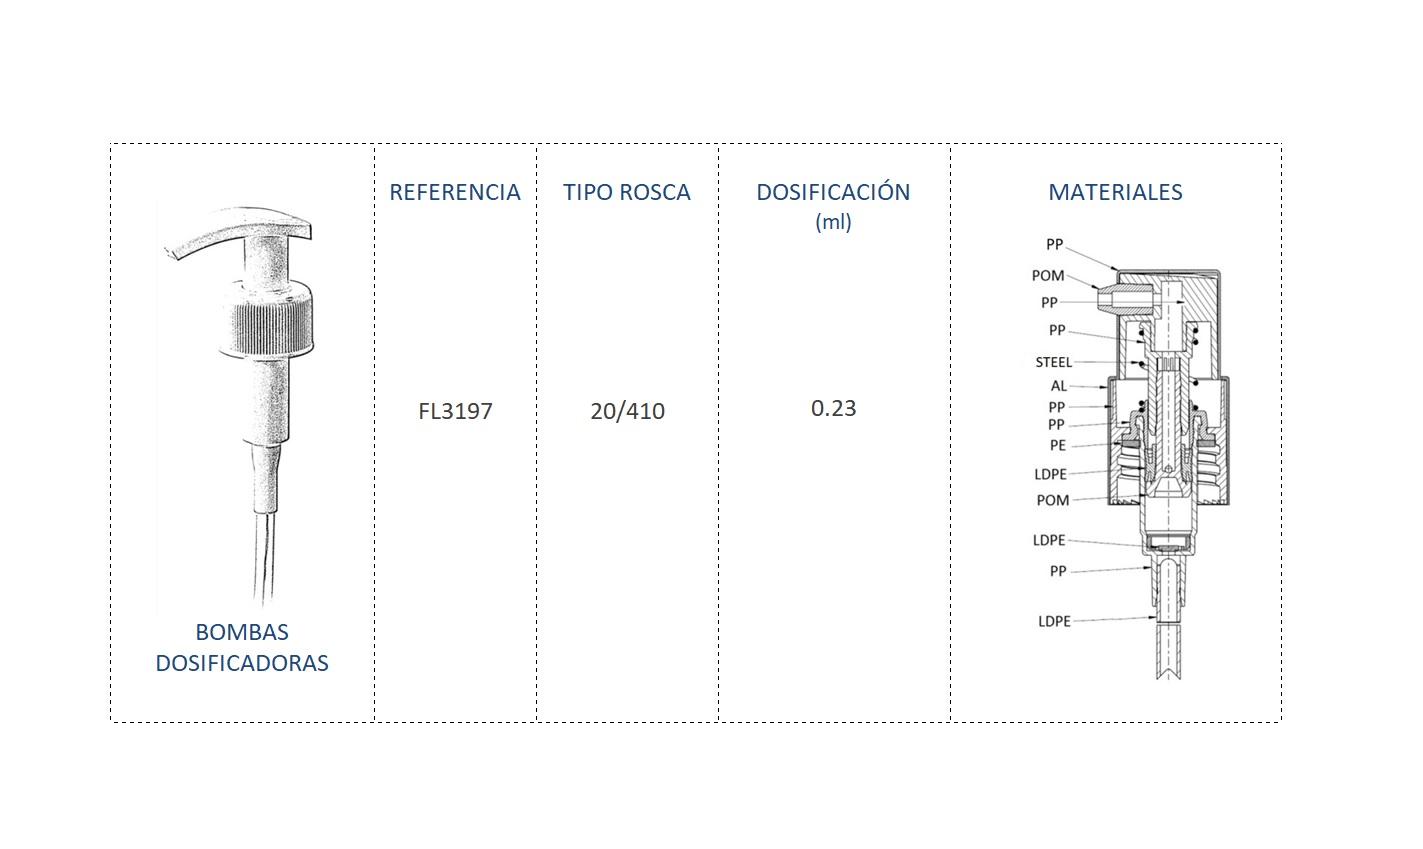 Cuadro de materiales FL3197 20/410